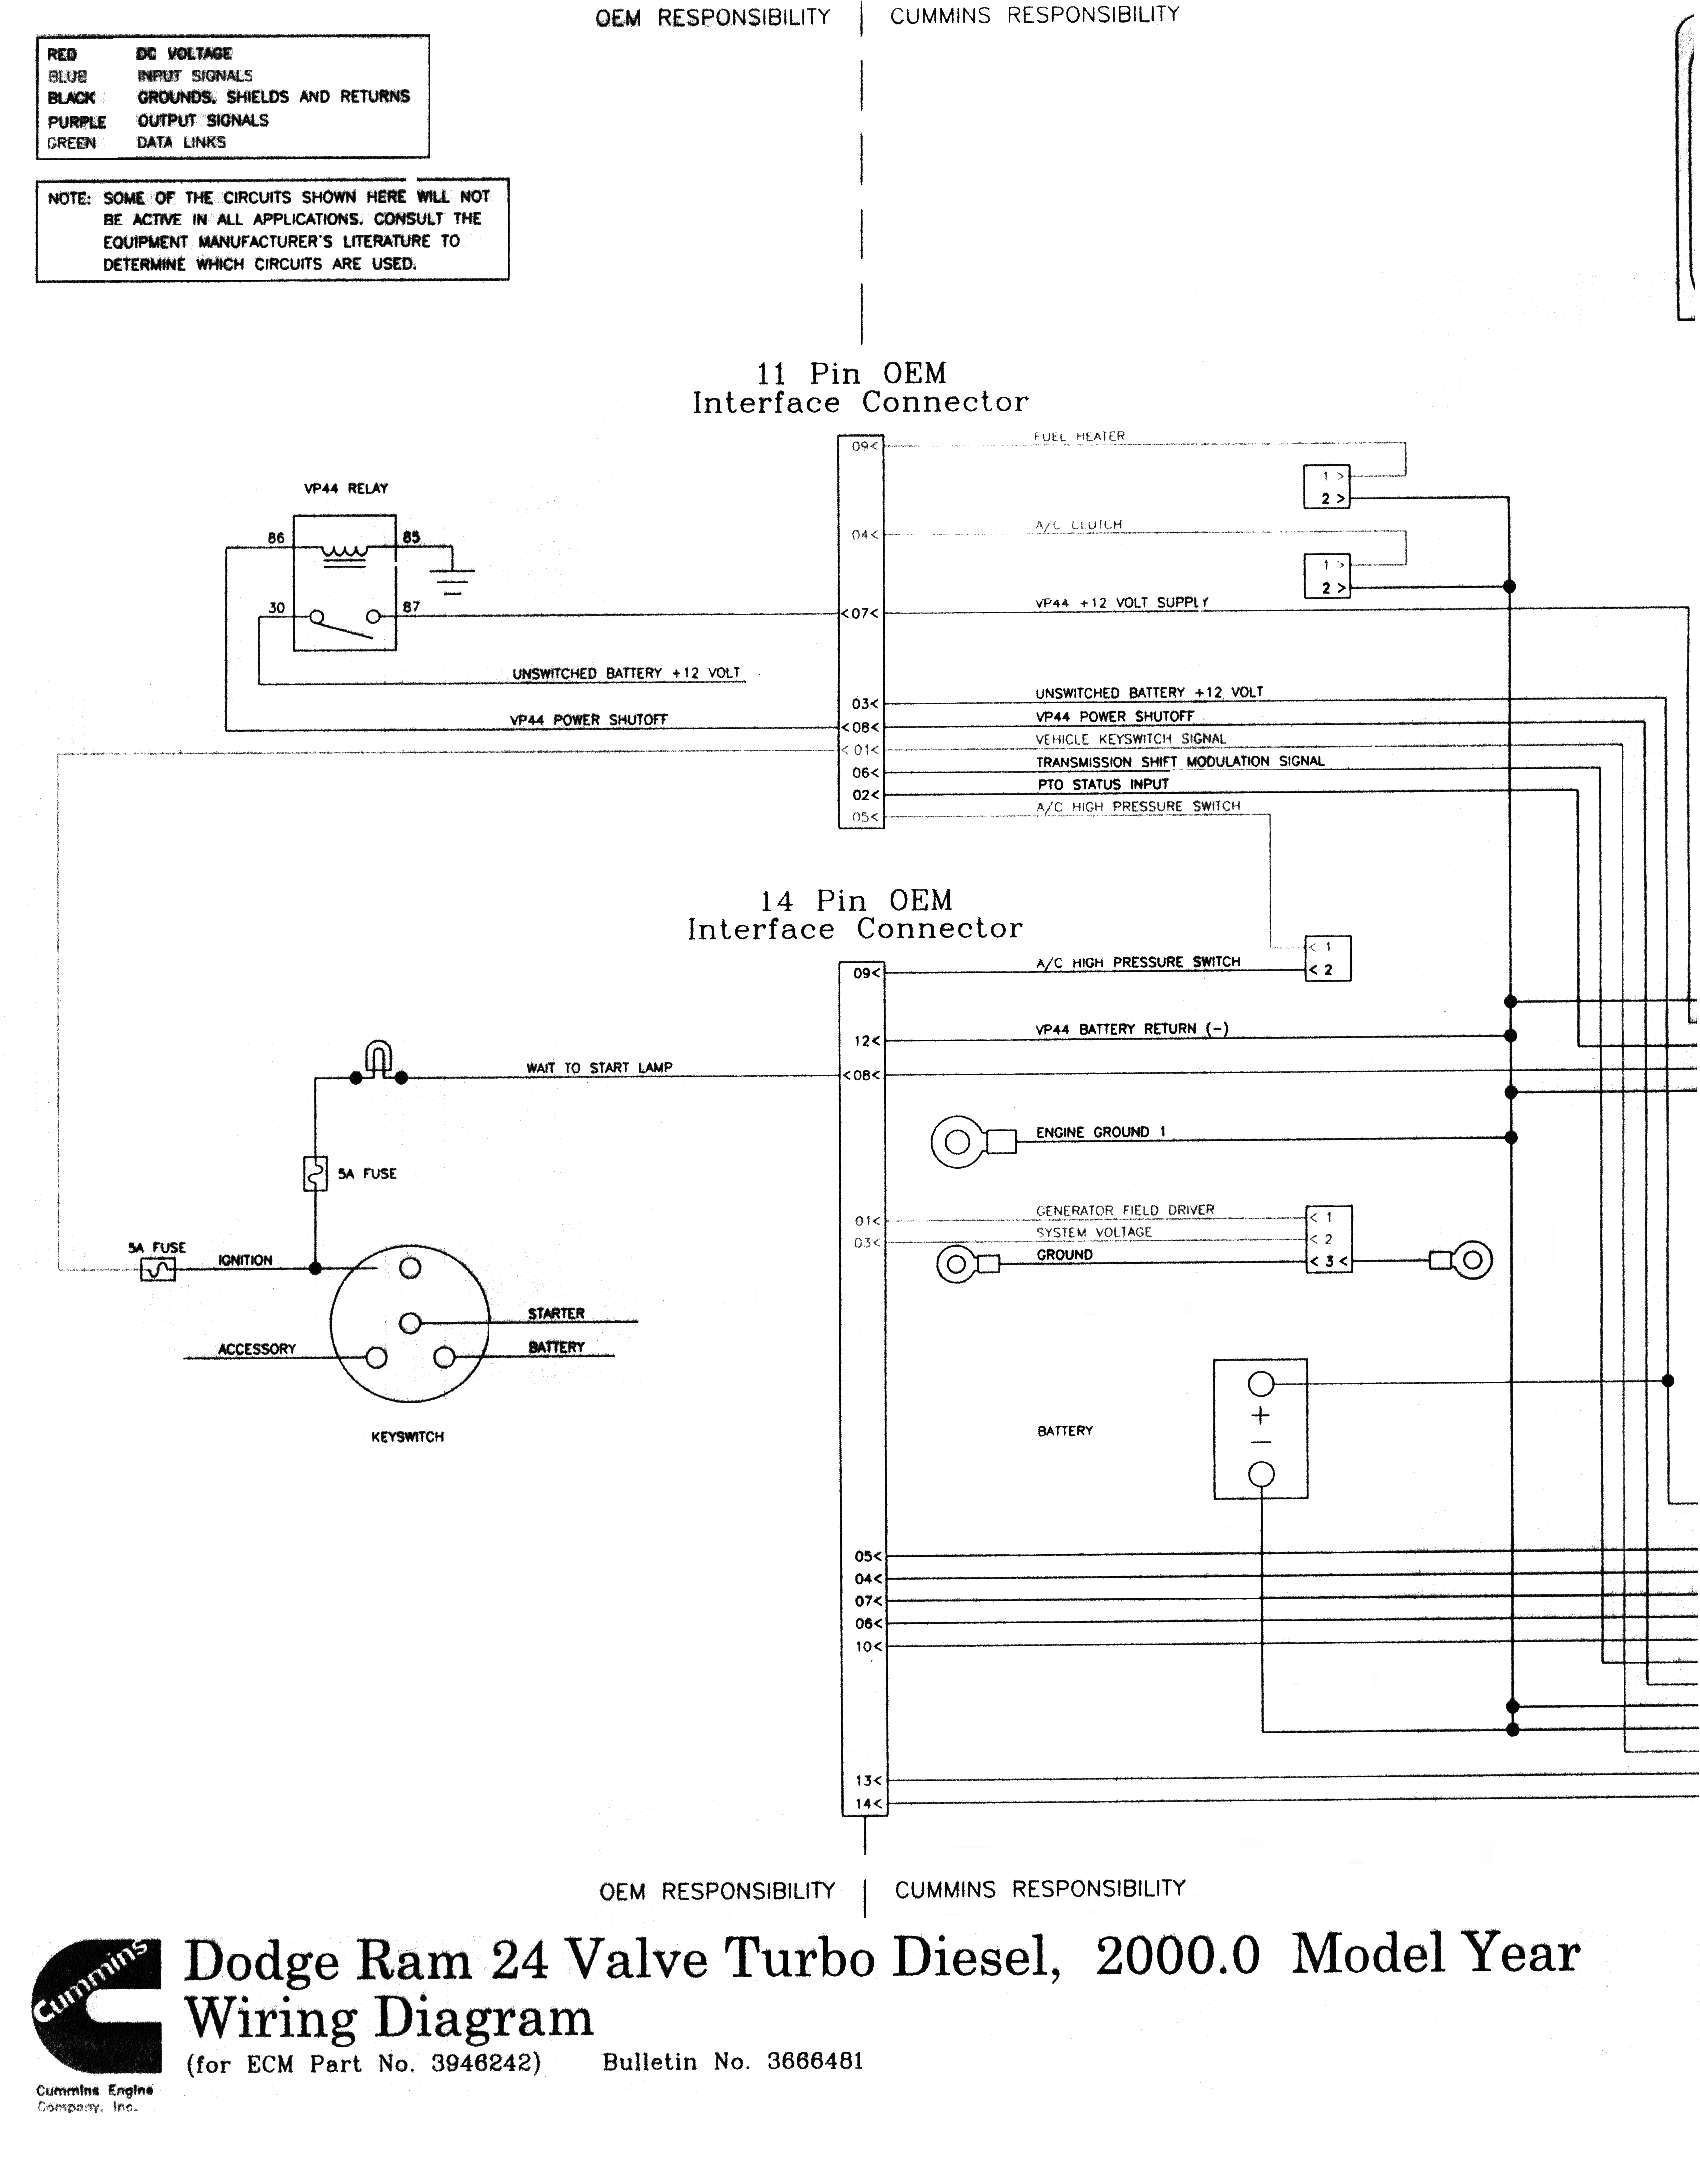 Diesel Engine Fuel System Diagram Dodge Cummins Diesel Fuel Line Diagram  Dodge Obd Connector Wiring